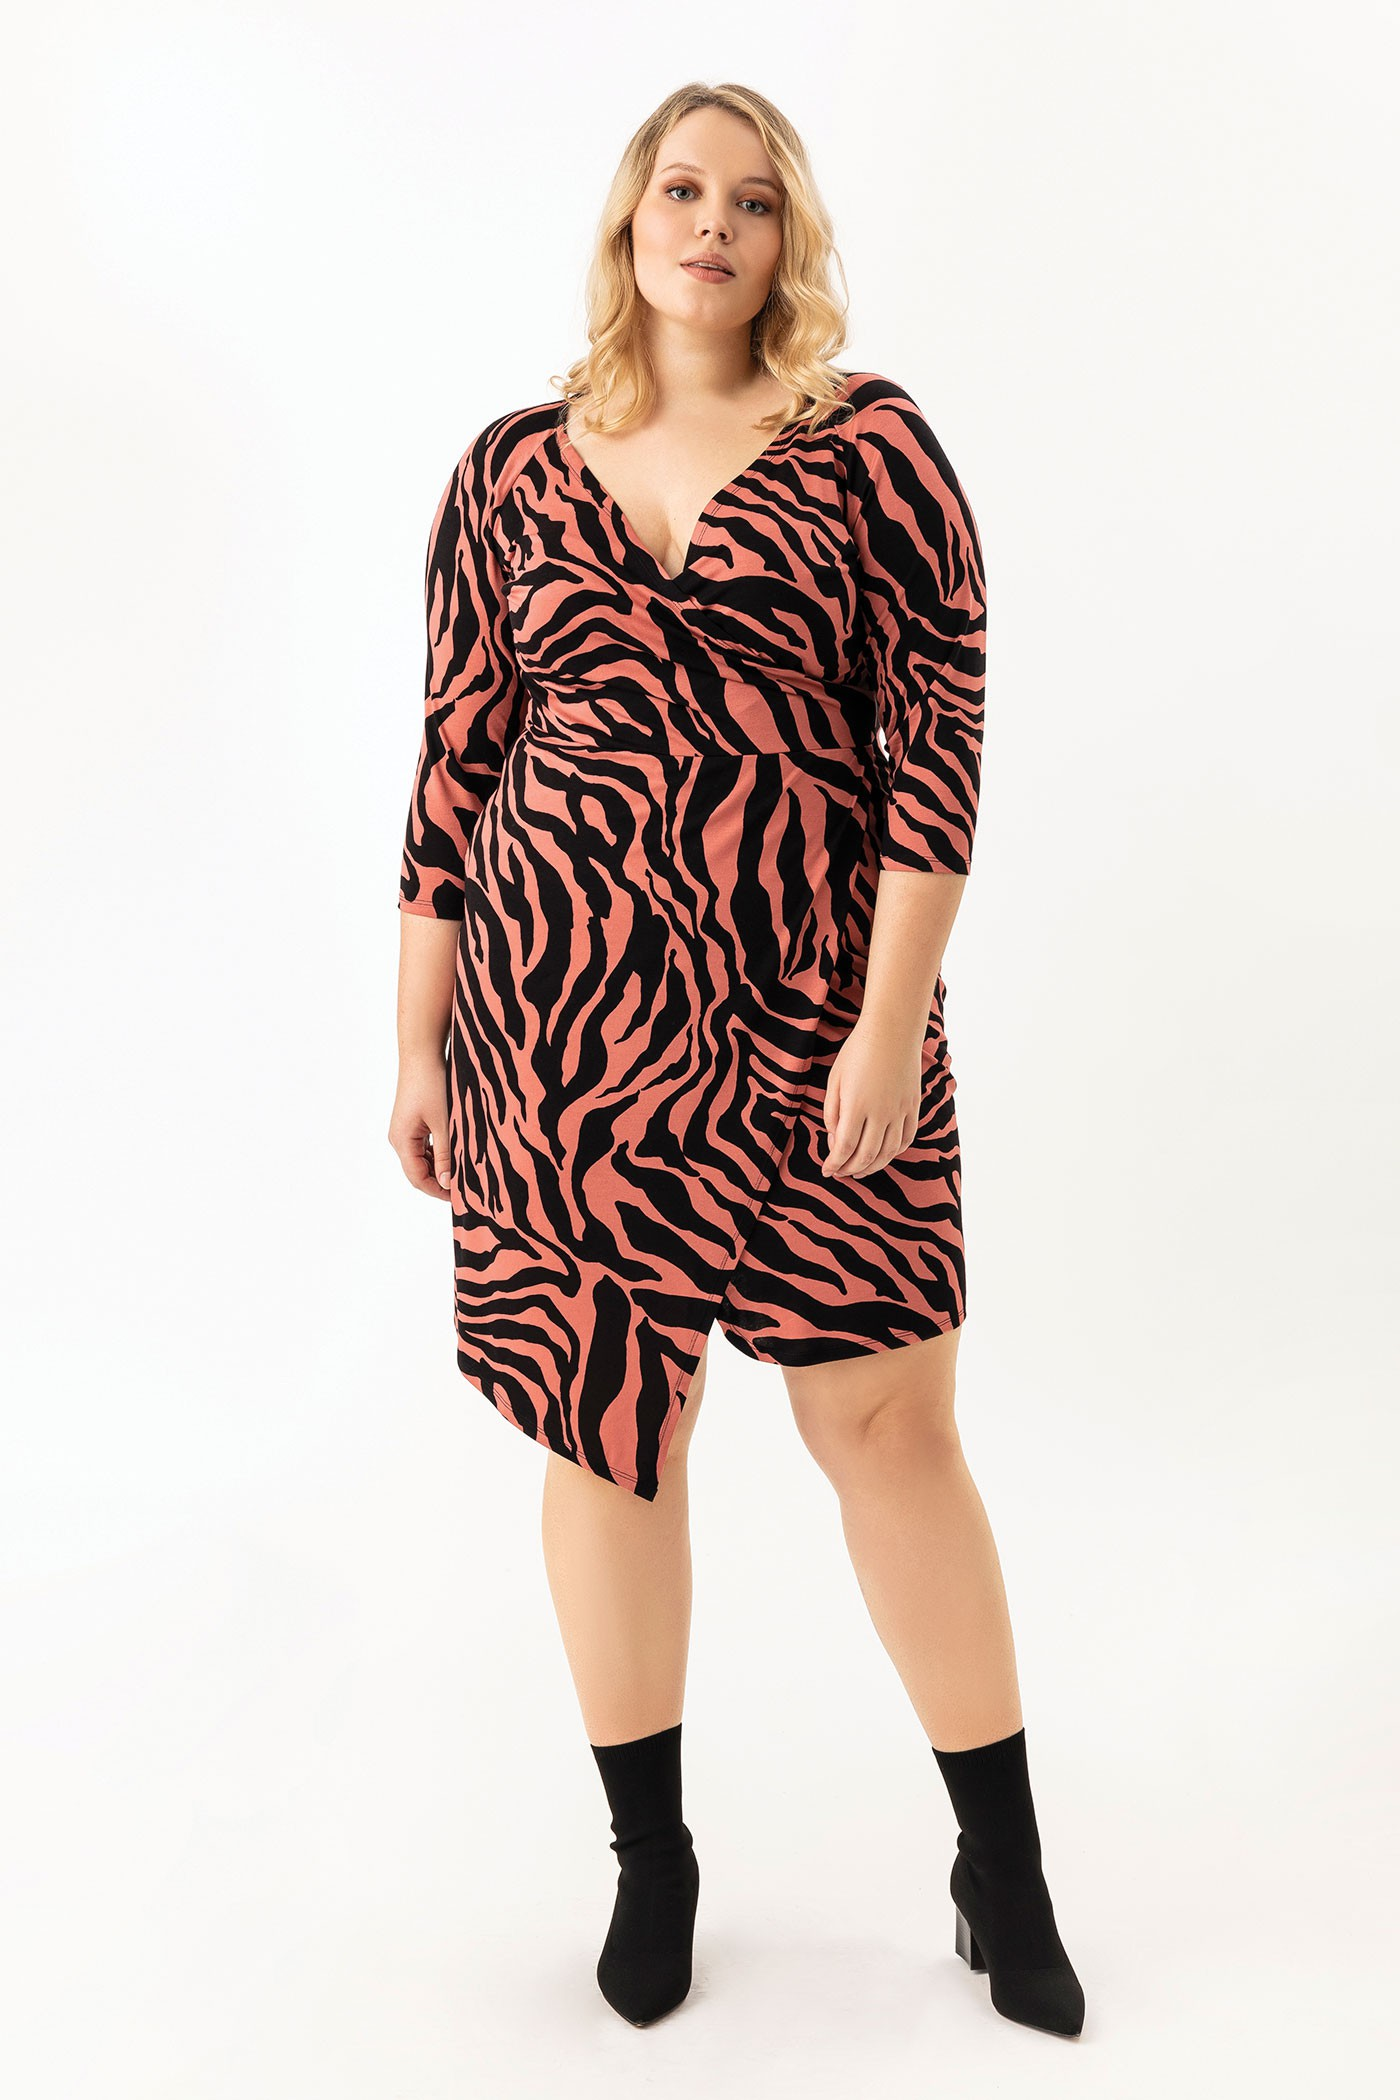 CHITA ZEBRA seksowna sukienka plus size